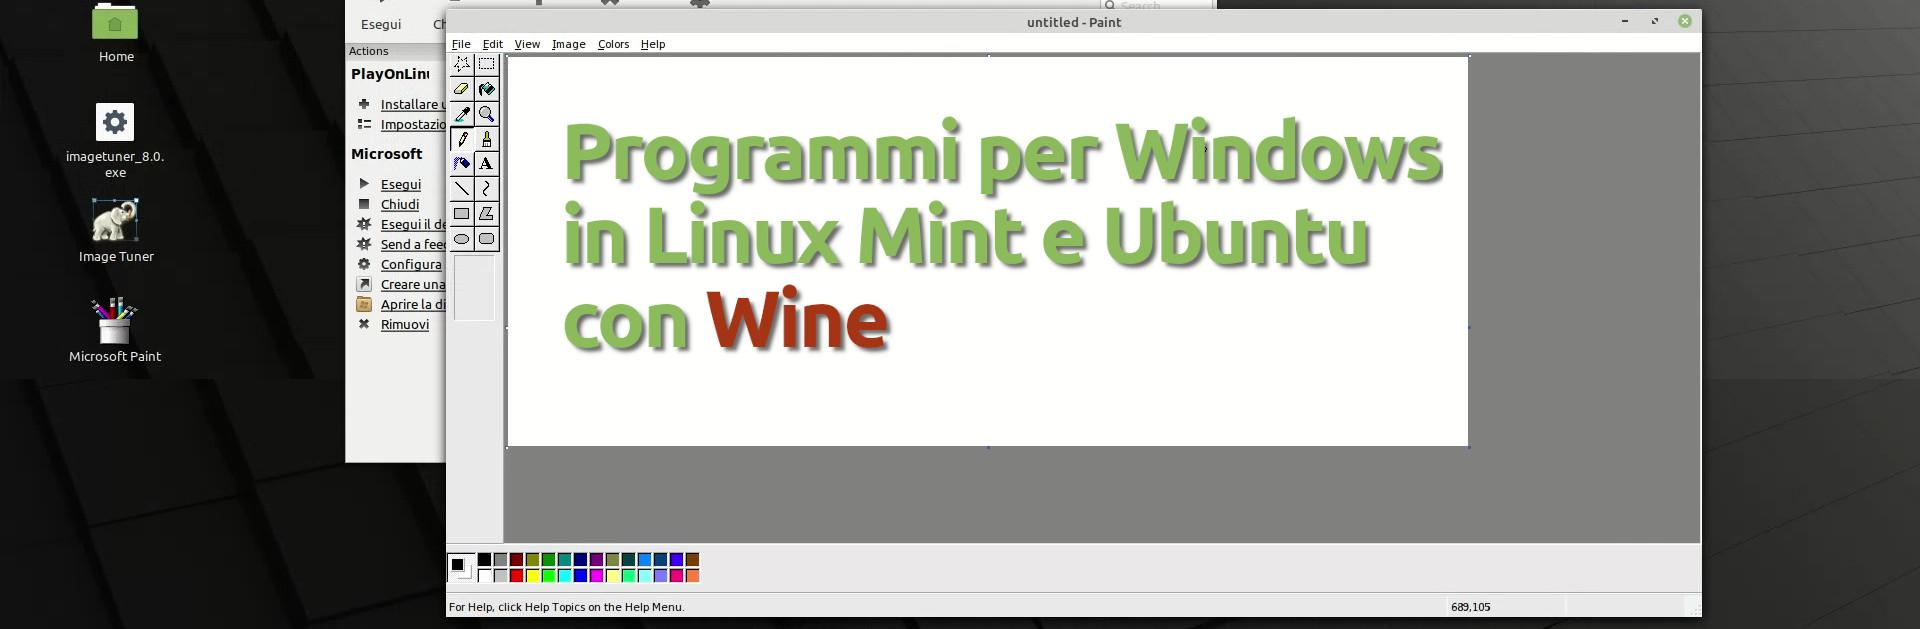 programmi windows in linux mint 20 e ubuntu con wine